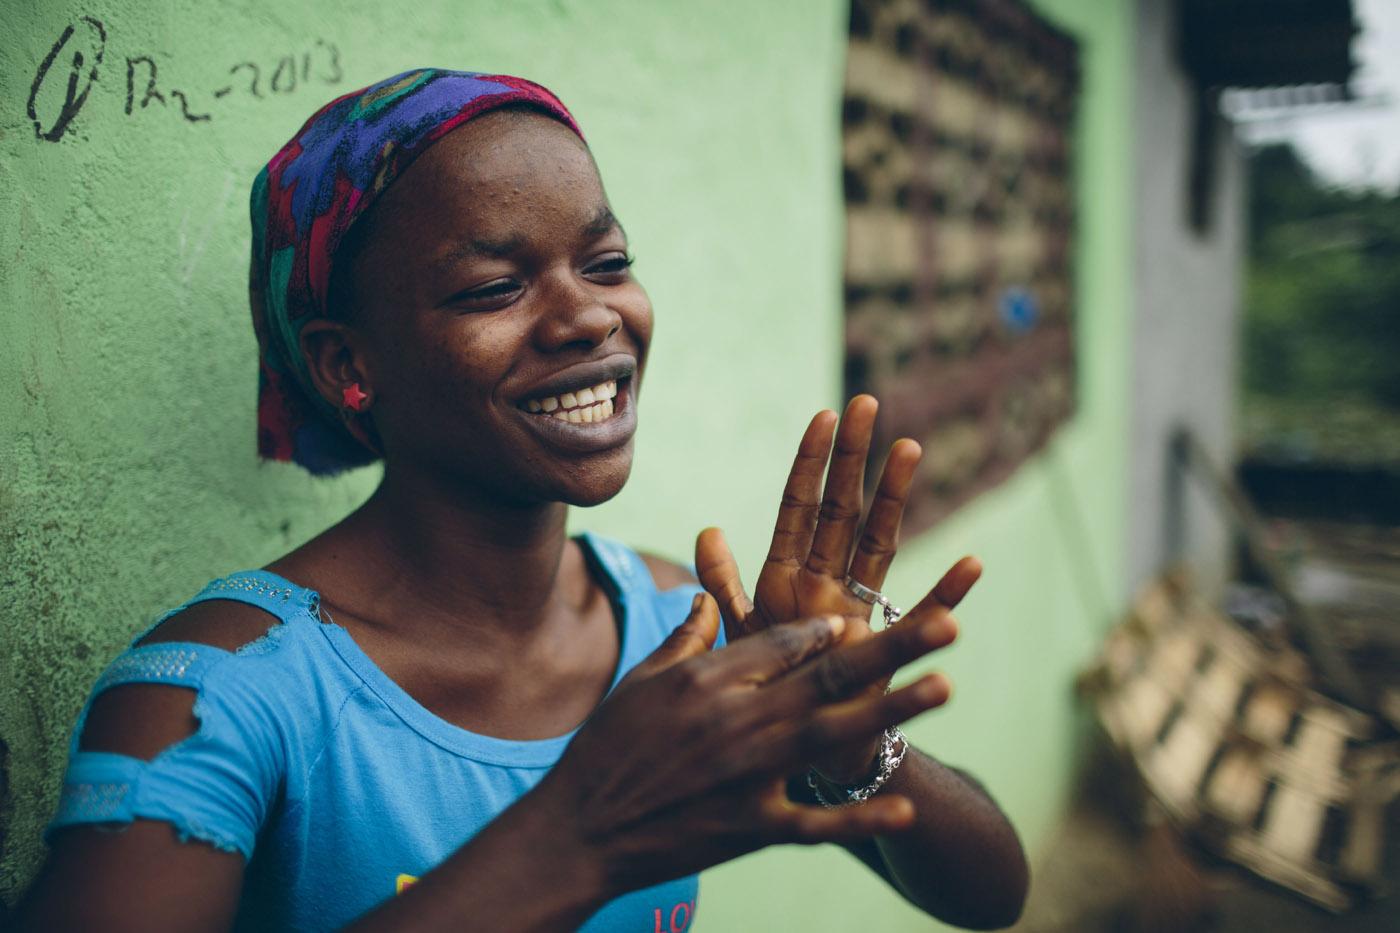 SFH-Liberia-_K3_9021.jpg